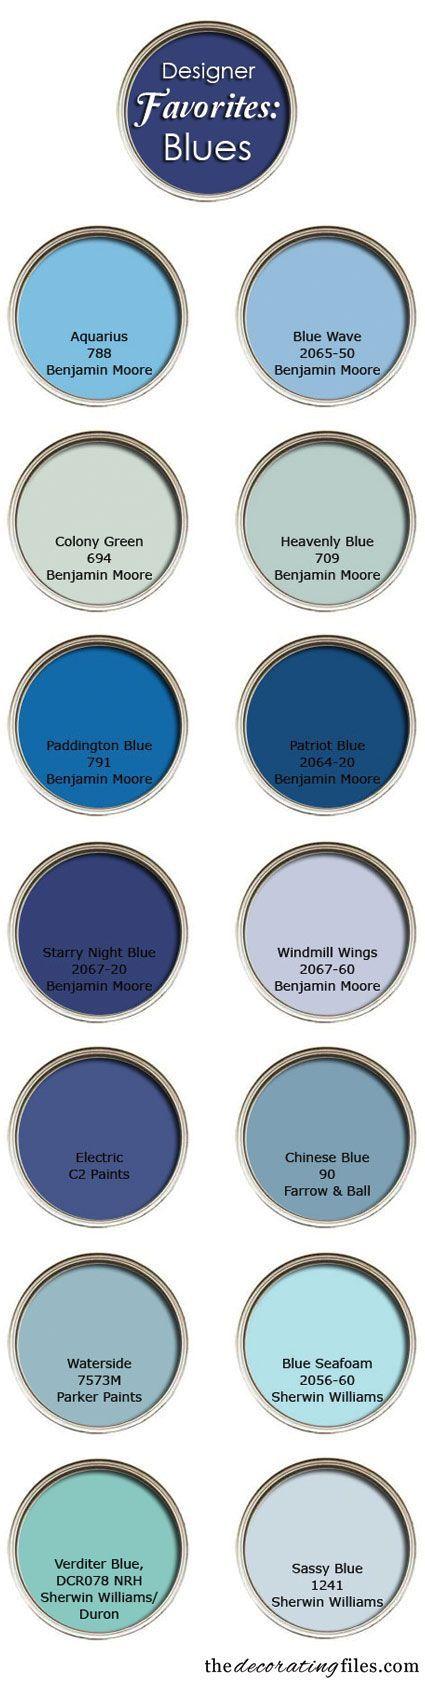 """Blue Paint Colors: Designer's Favorite Picks"" by the decorating files (http://decoratingfiles.com)"